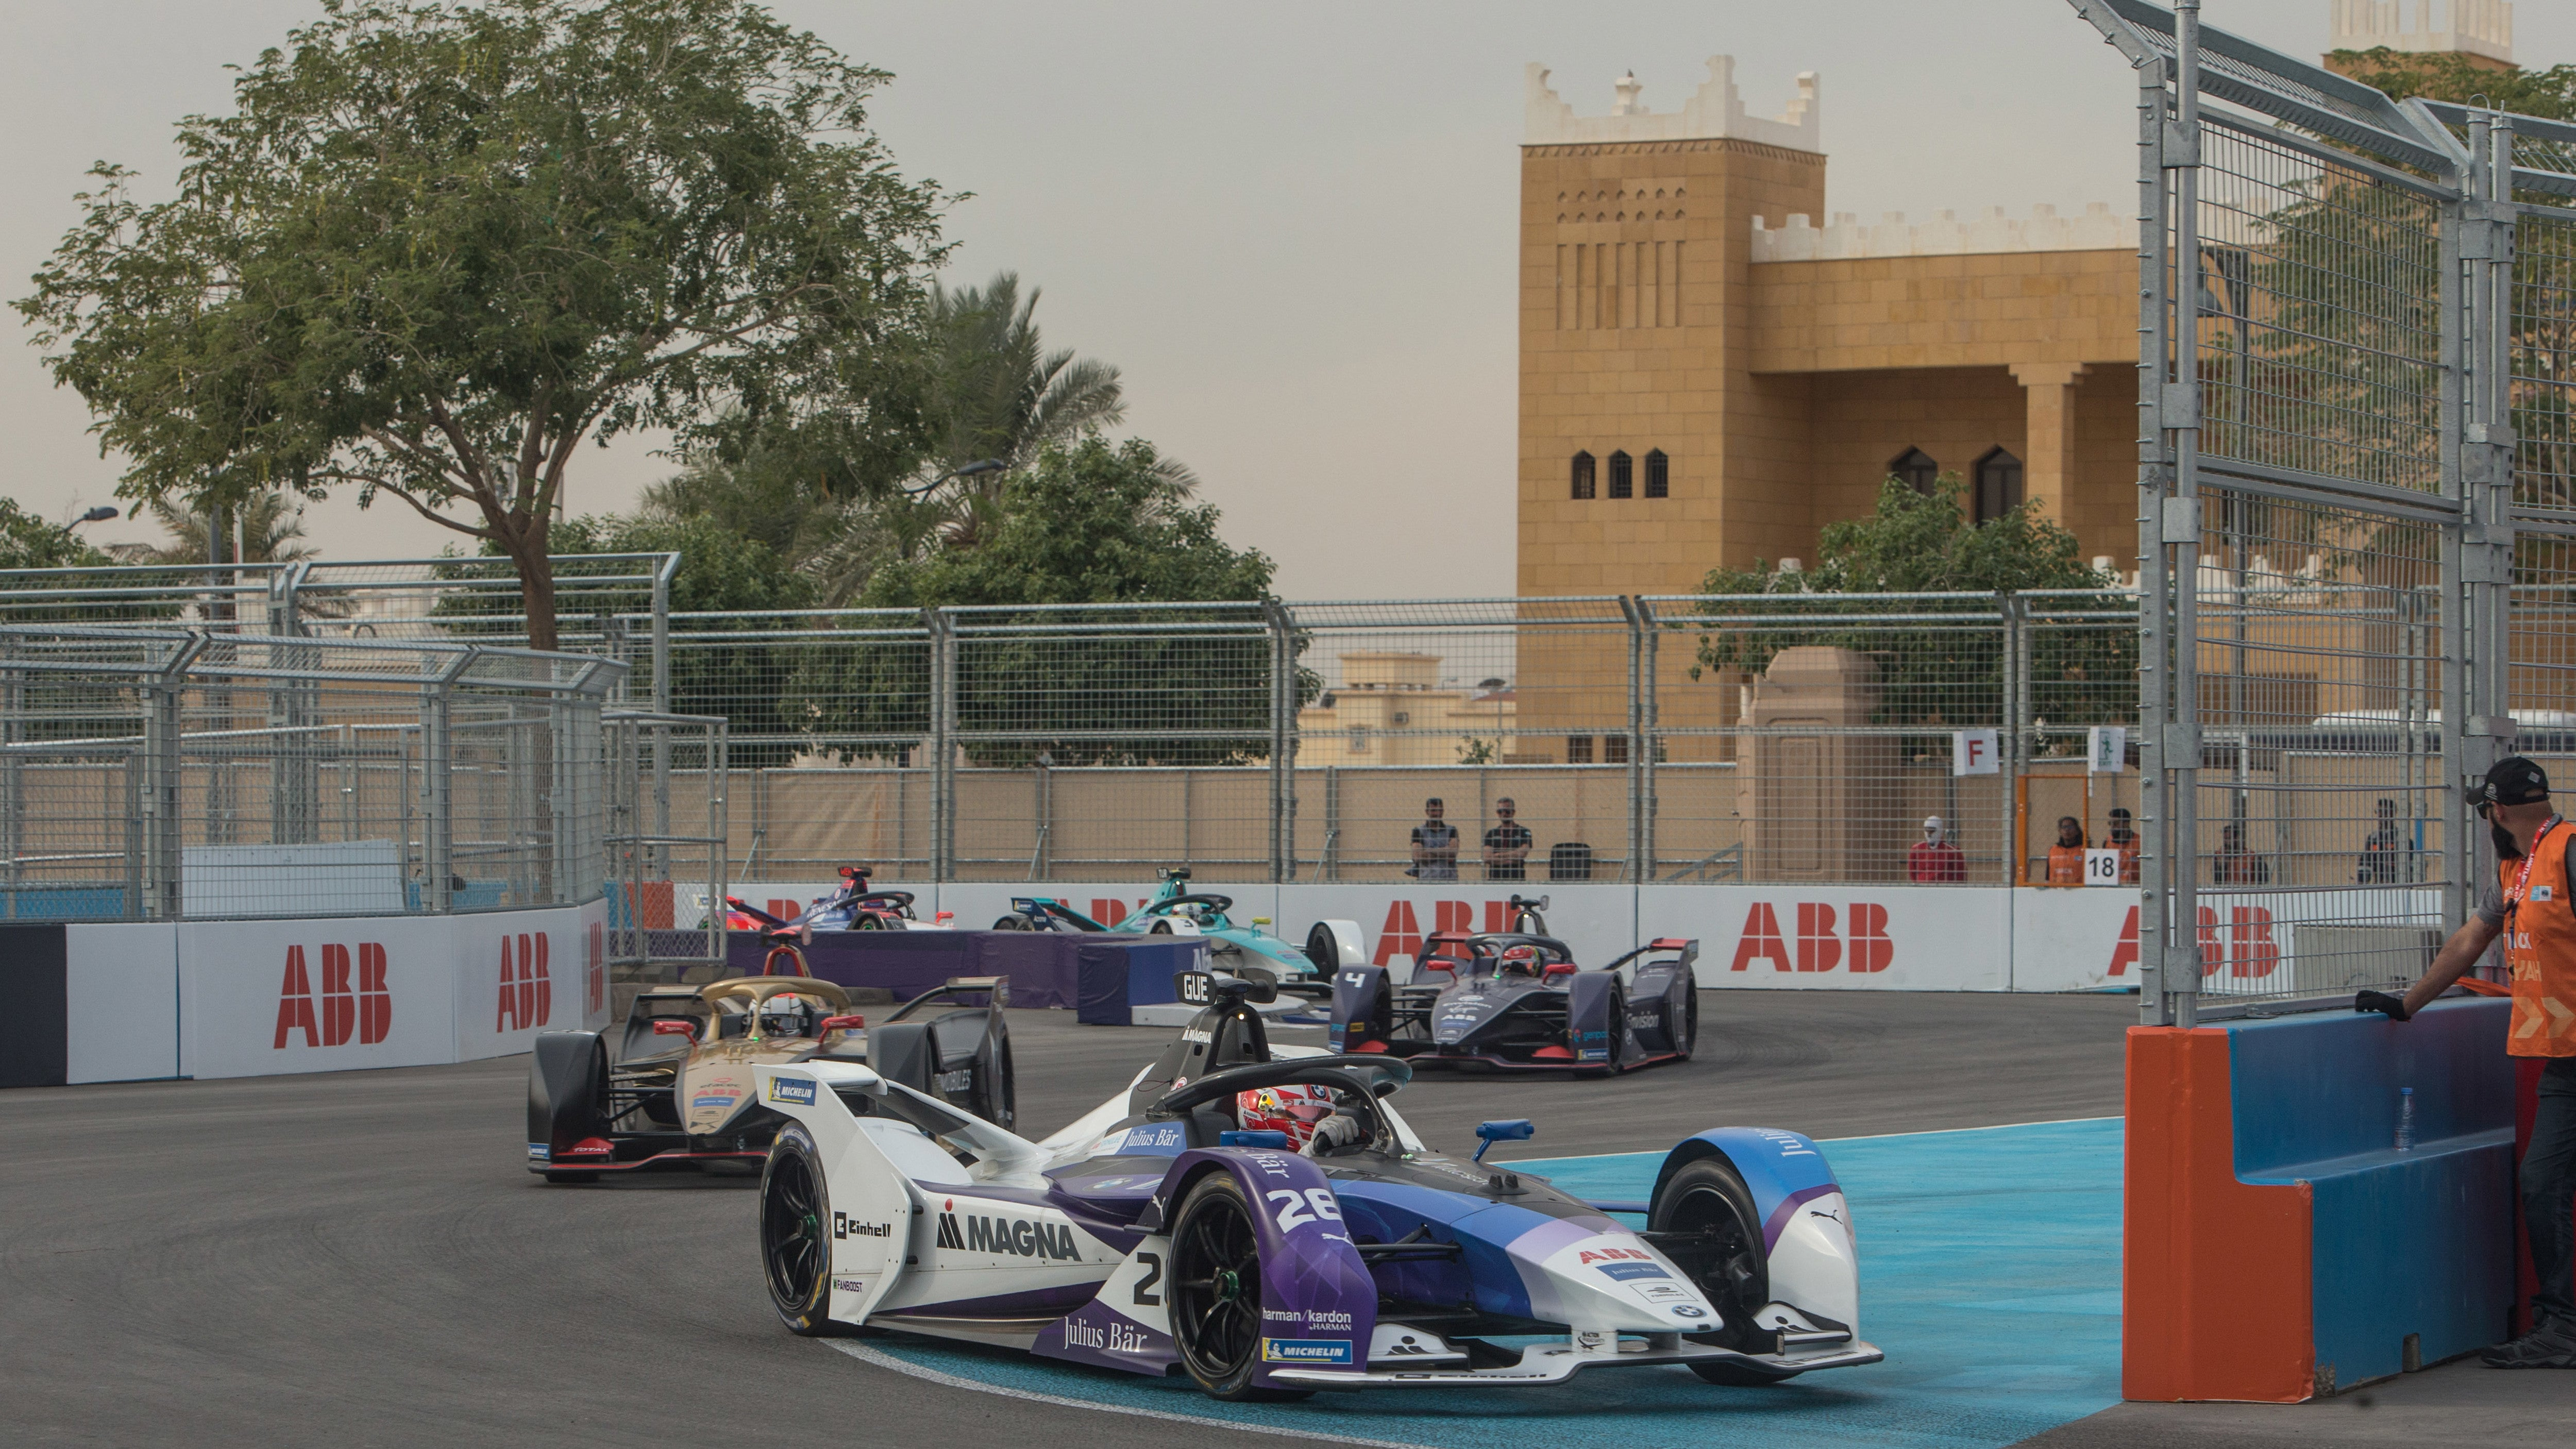 Saudi Arabia Races To Change The Subject